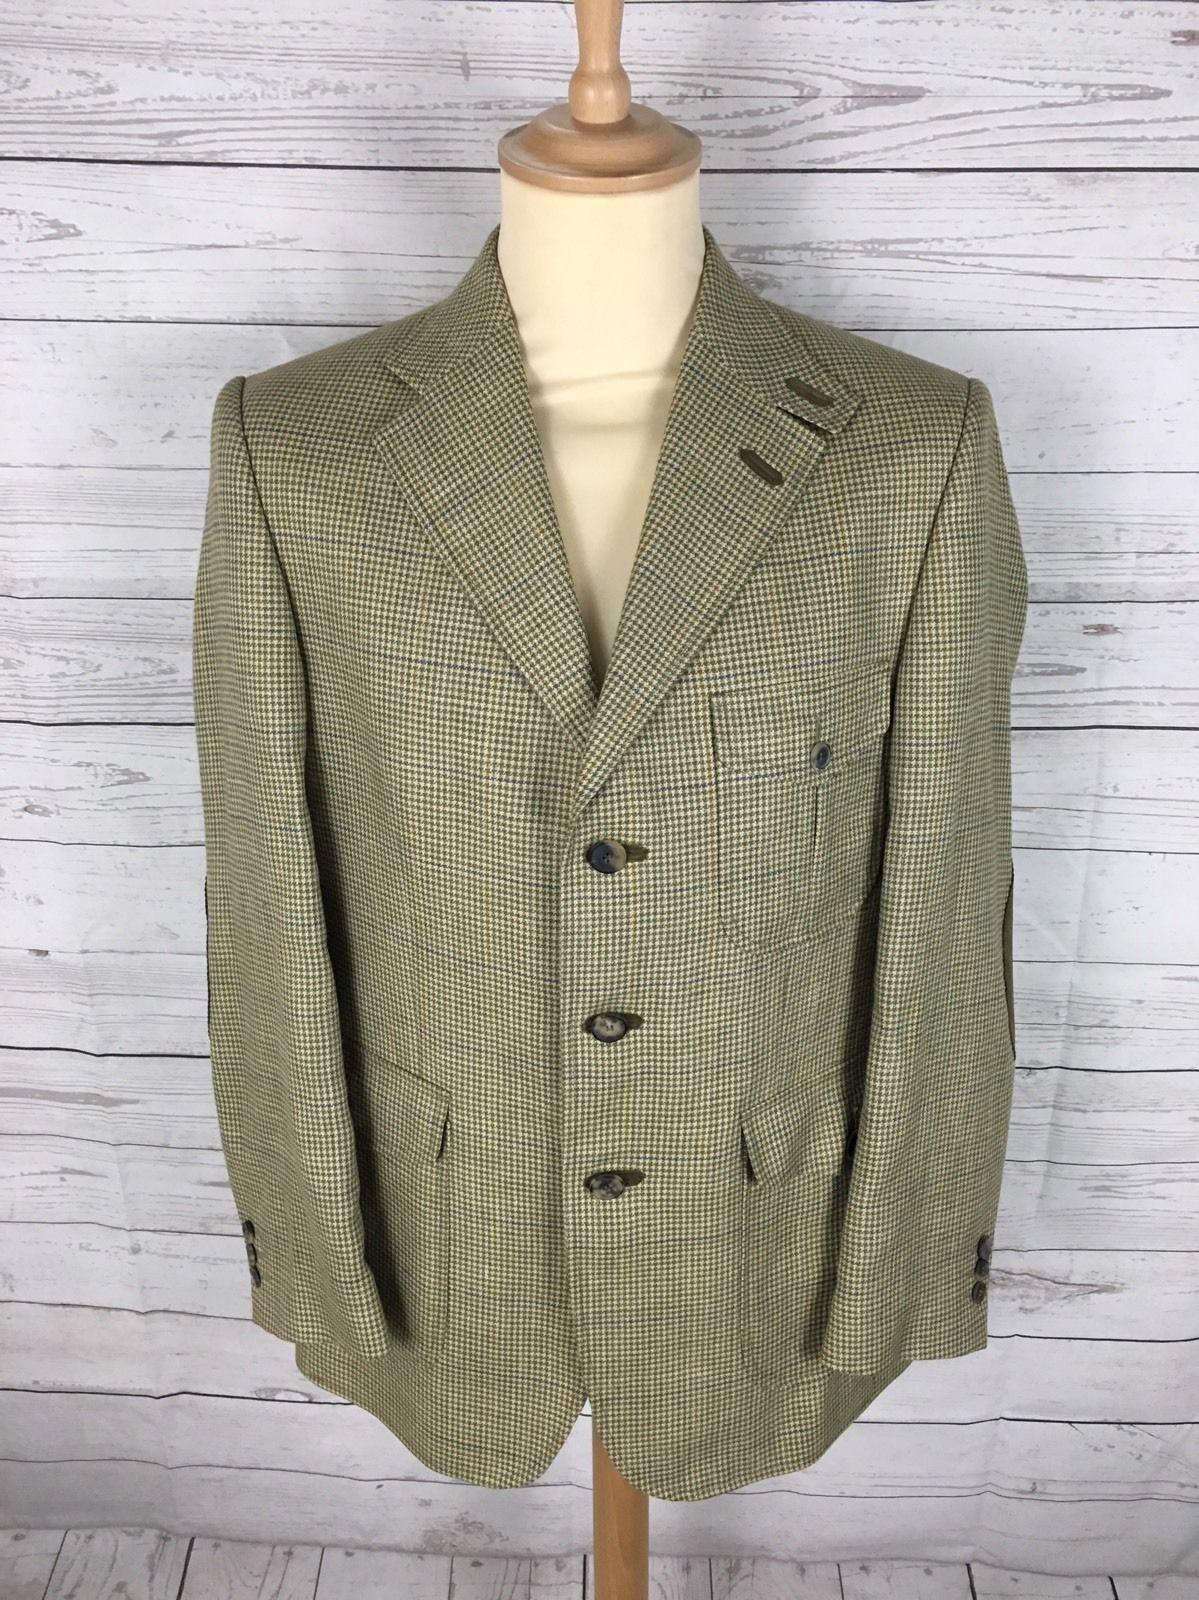 Mens DAKS Tweed Hunting/Shooting Jacket/Blazer - 42R - Great Condition |  eBay